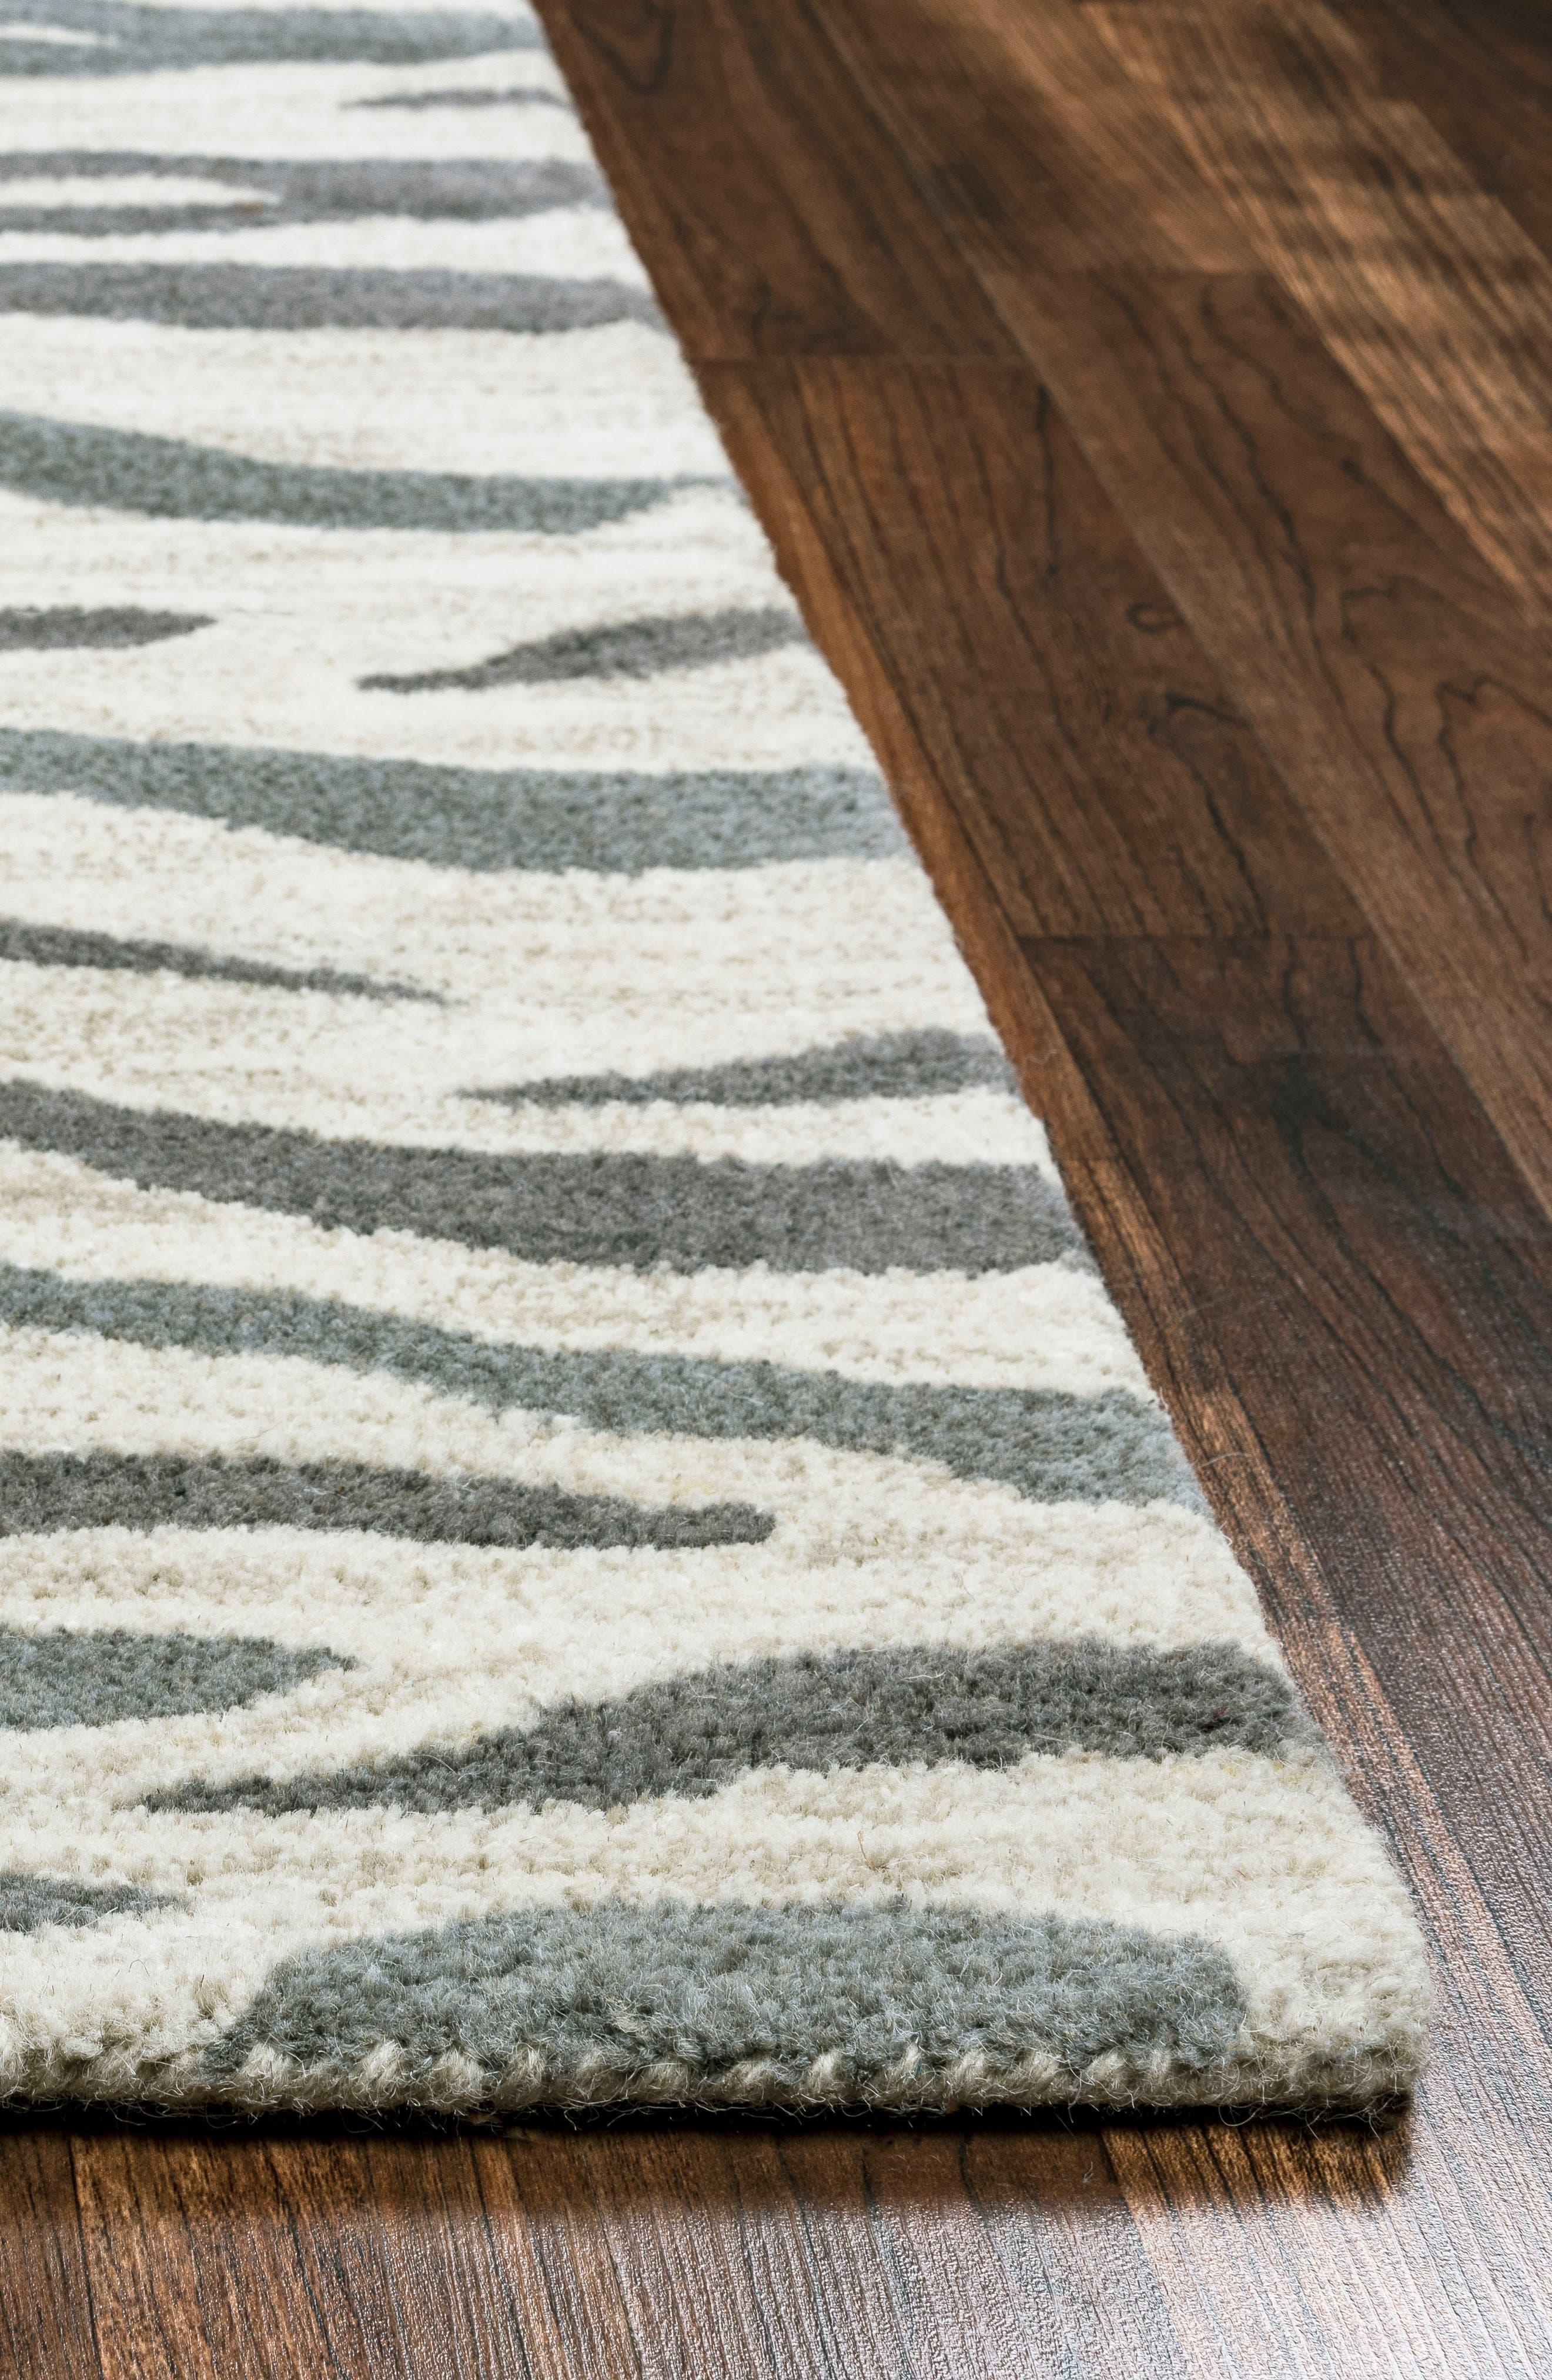 'Valintino Zebra' Hand Tufted Wool Area Rug,                             Alternate thumbnail 4, color,                             020